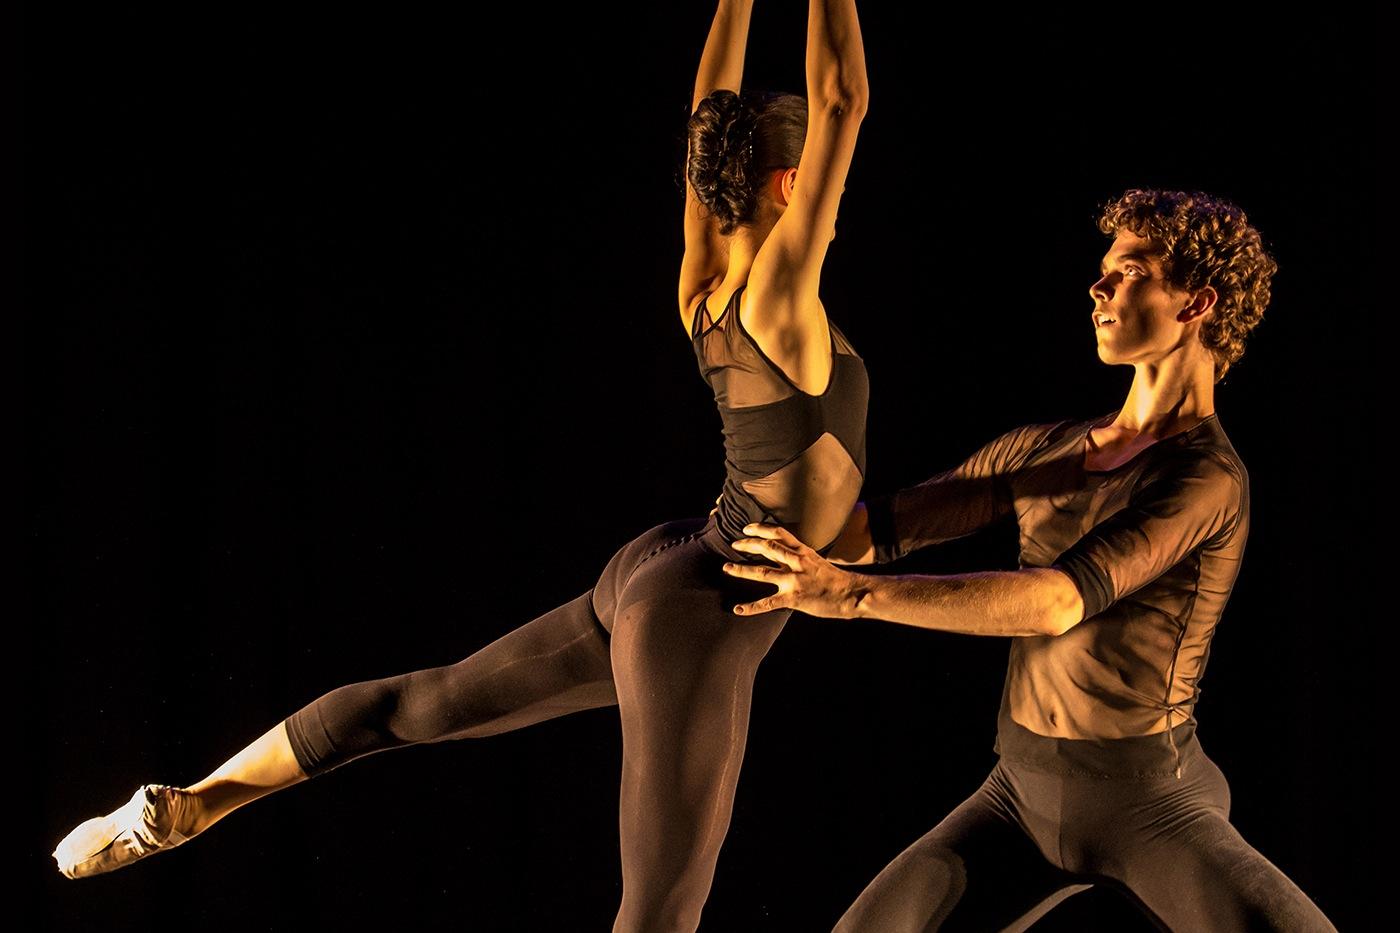 photographe-reportage-danse-avec-ton-crous-guillaume-heraud-013-small